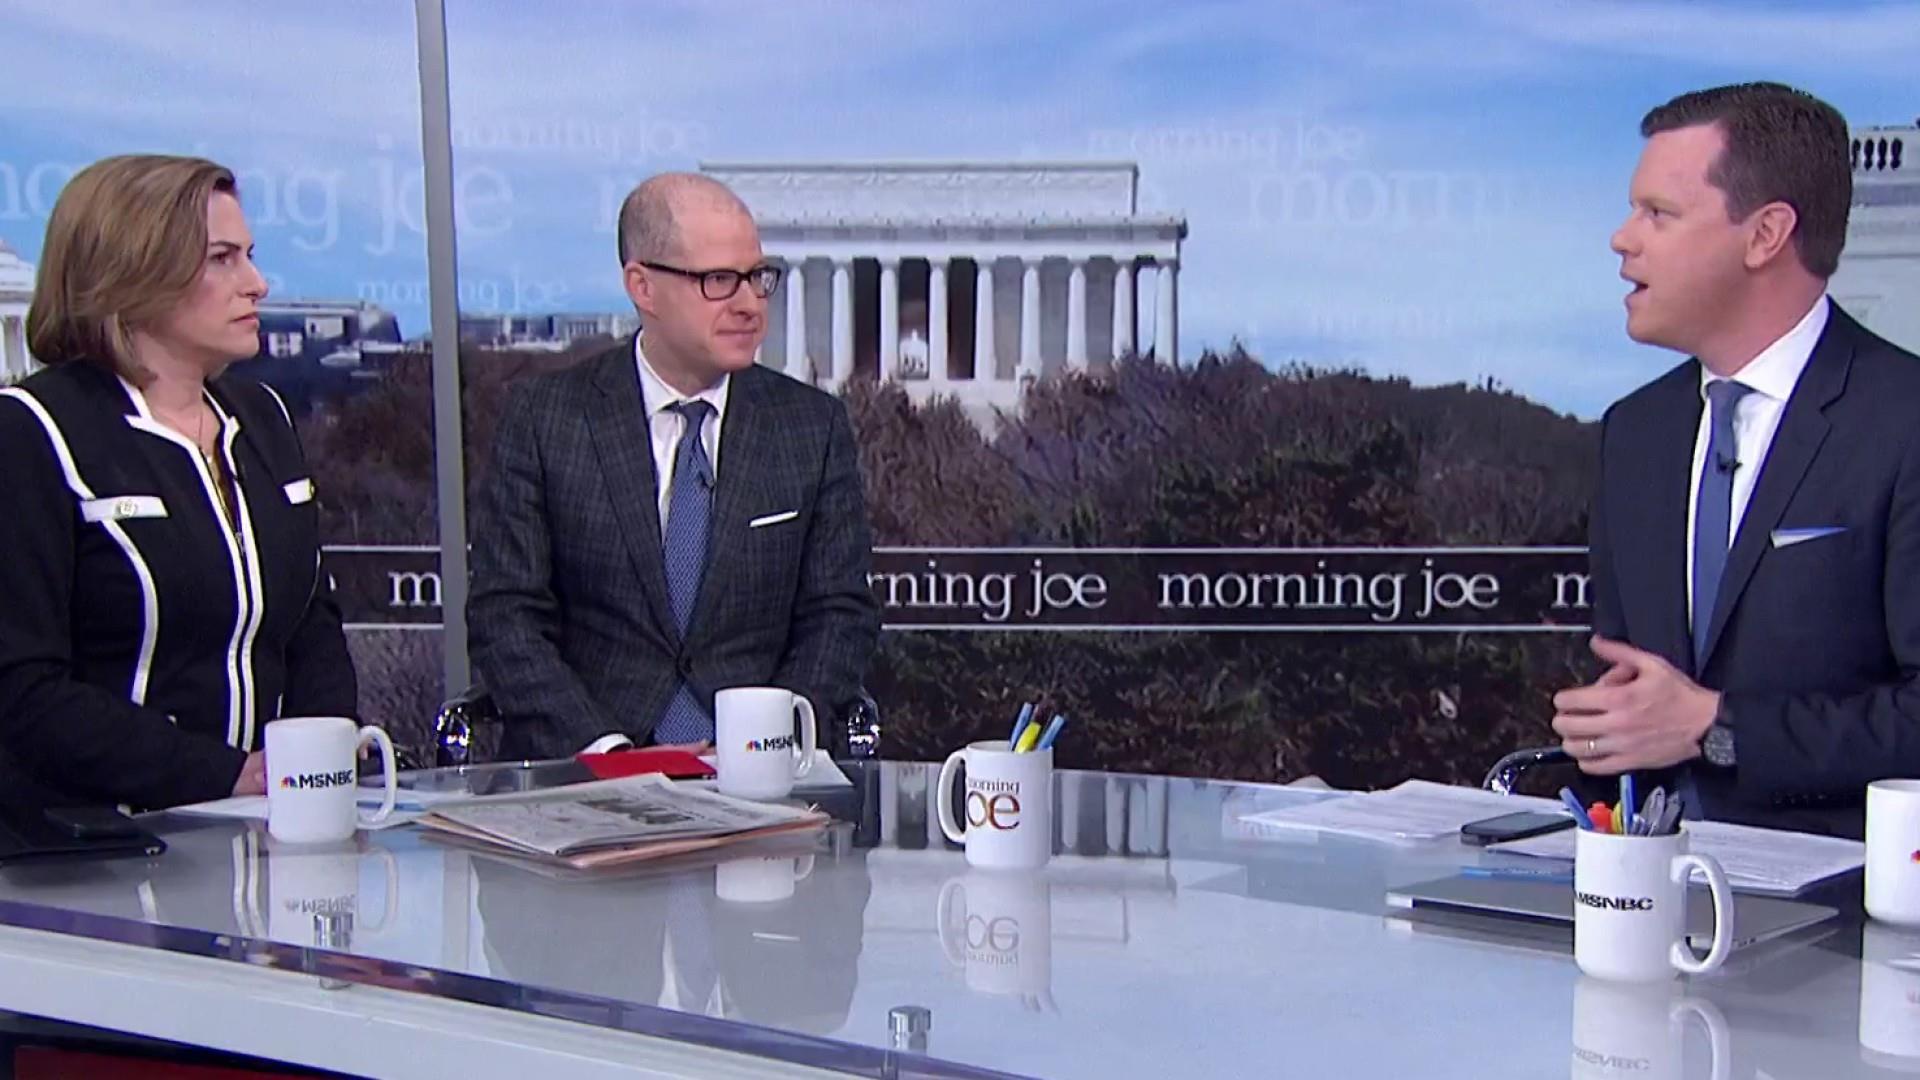 Putin makes announcement, and Trump has no response